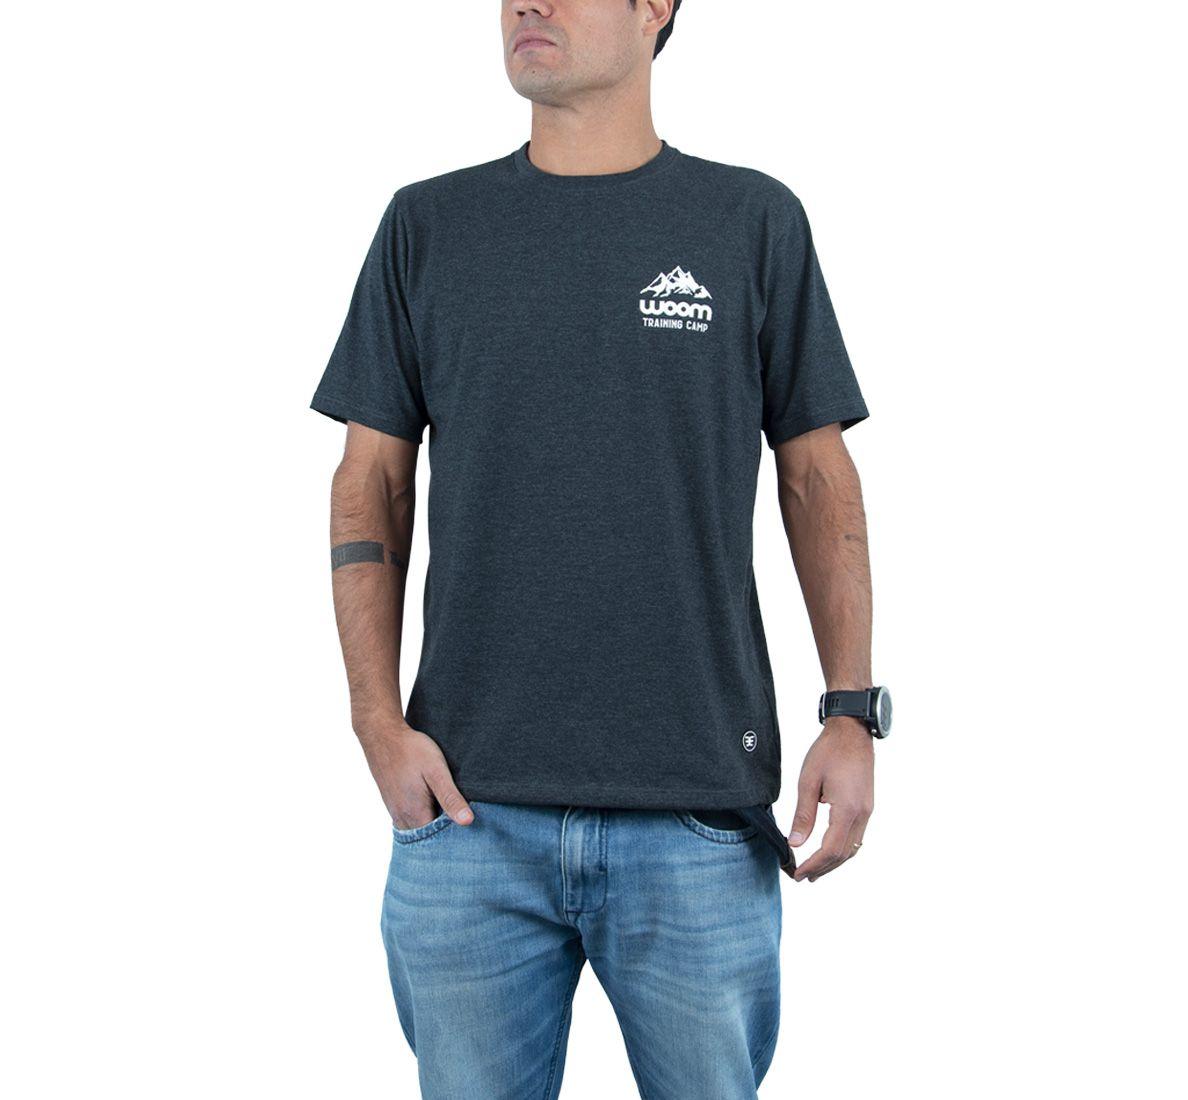 Camiseta Training Camp Masc - Dark Mescla - Woom 247